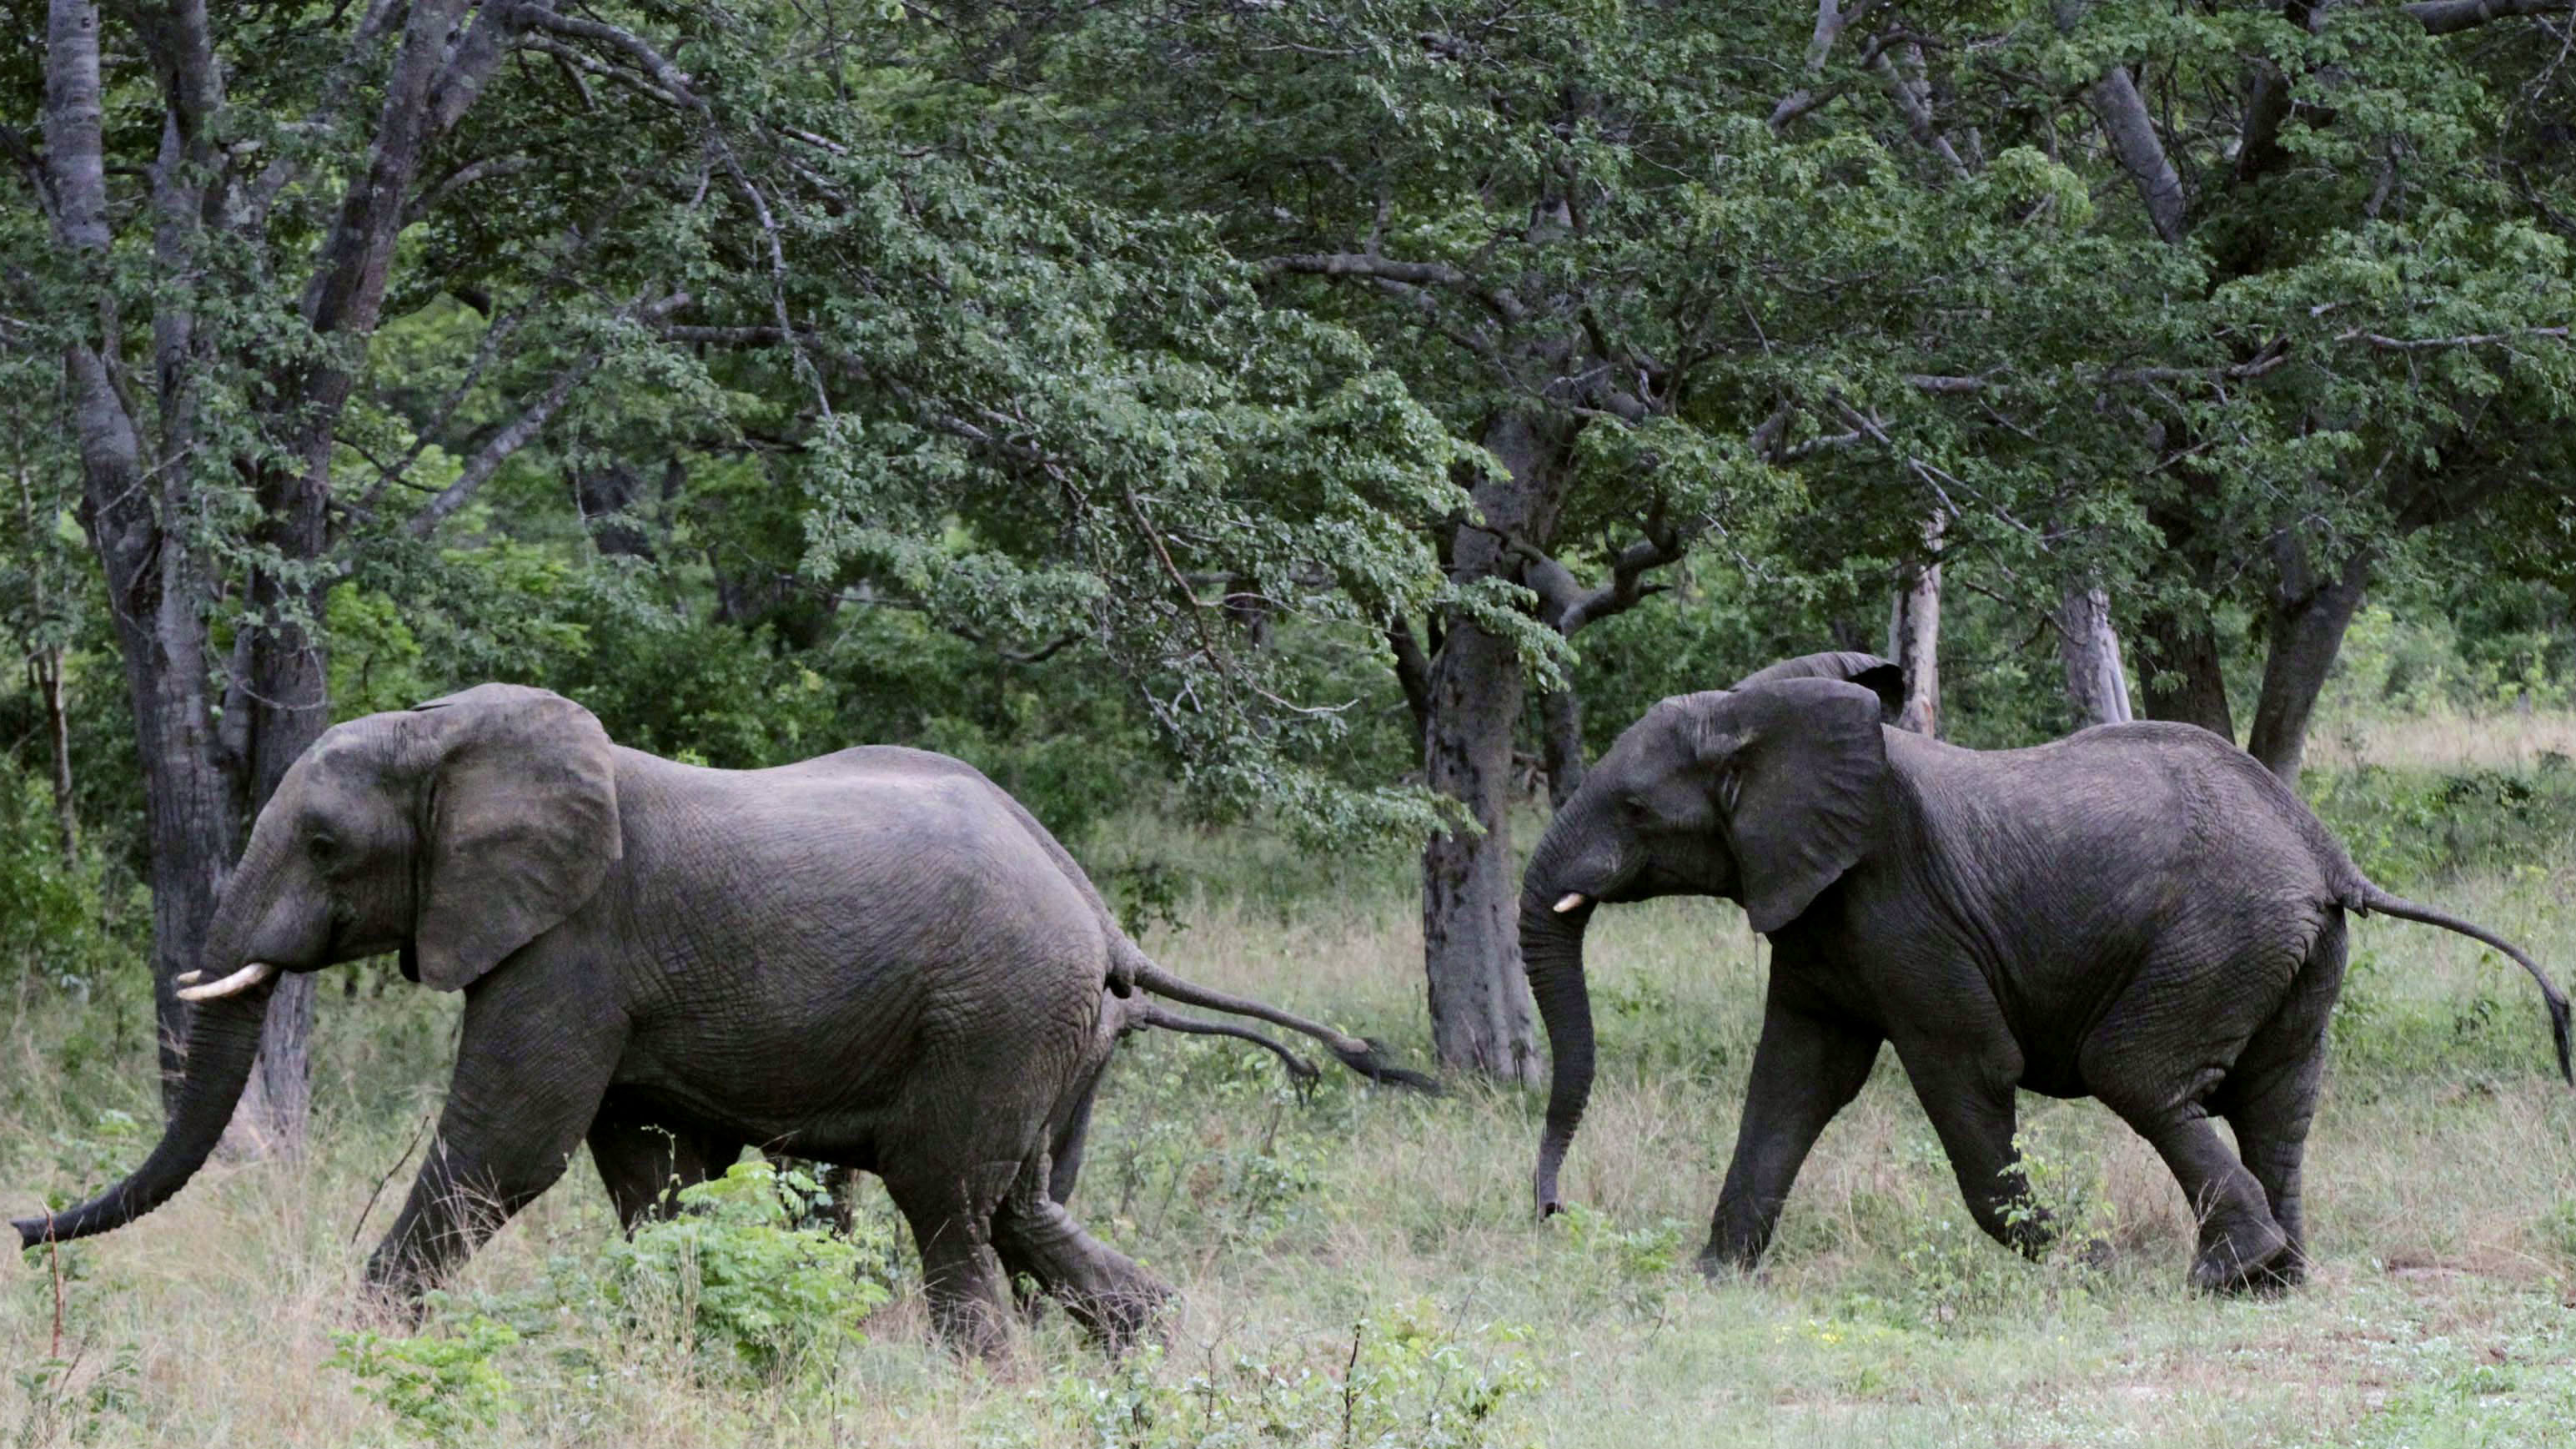 A pair of elephants walks inside Zimbabwe's Hwange National Park December 21, 2014